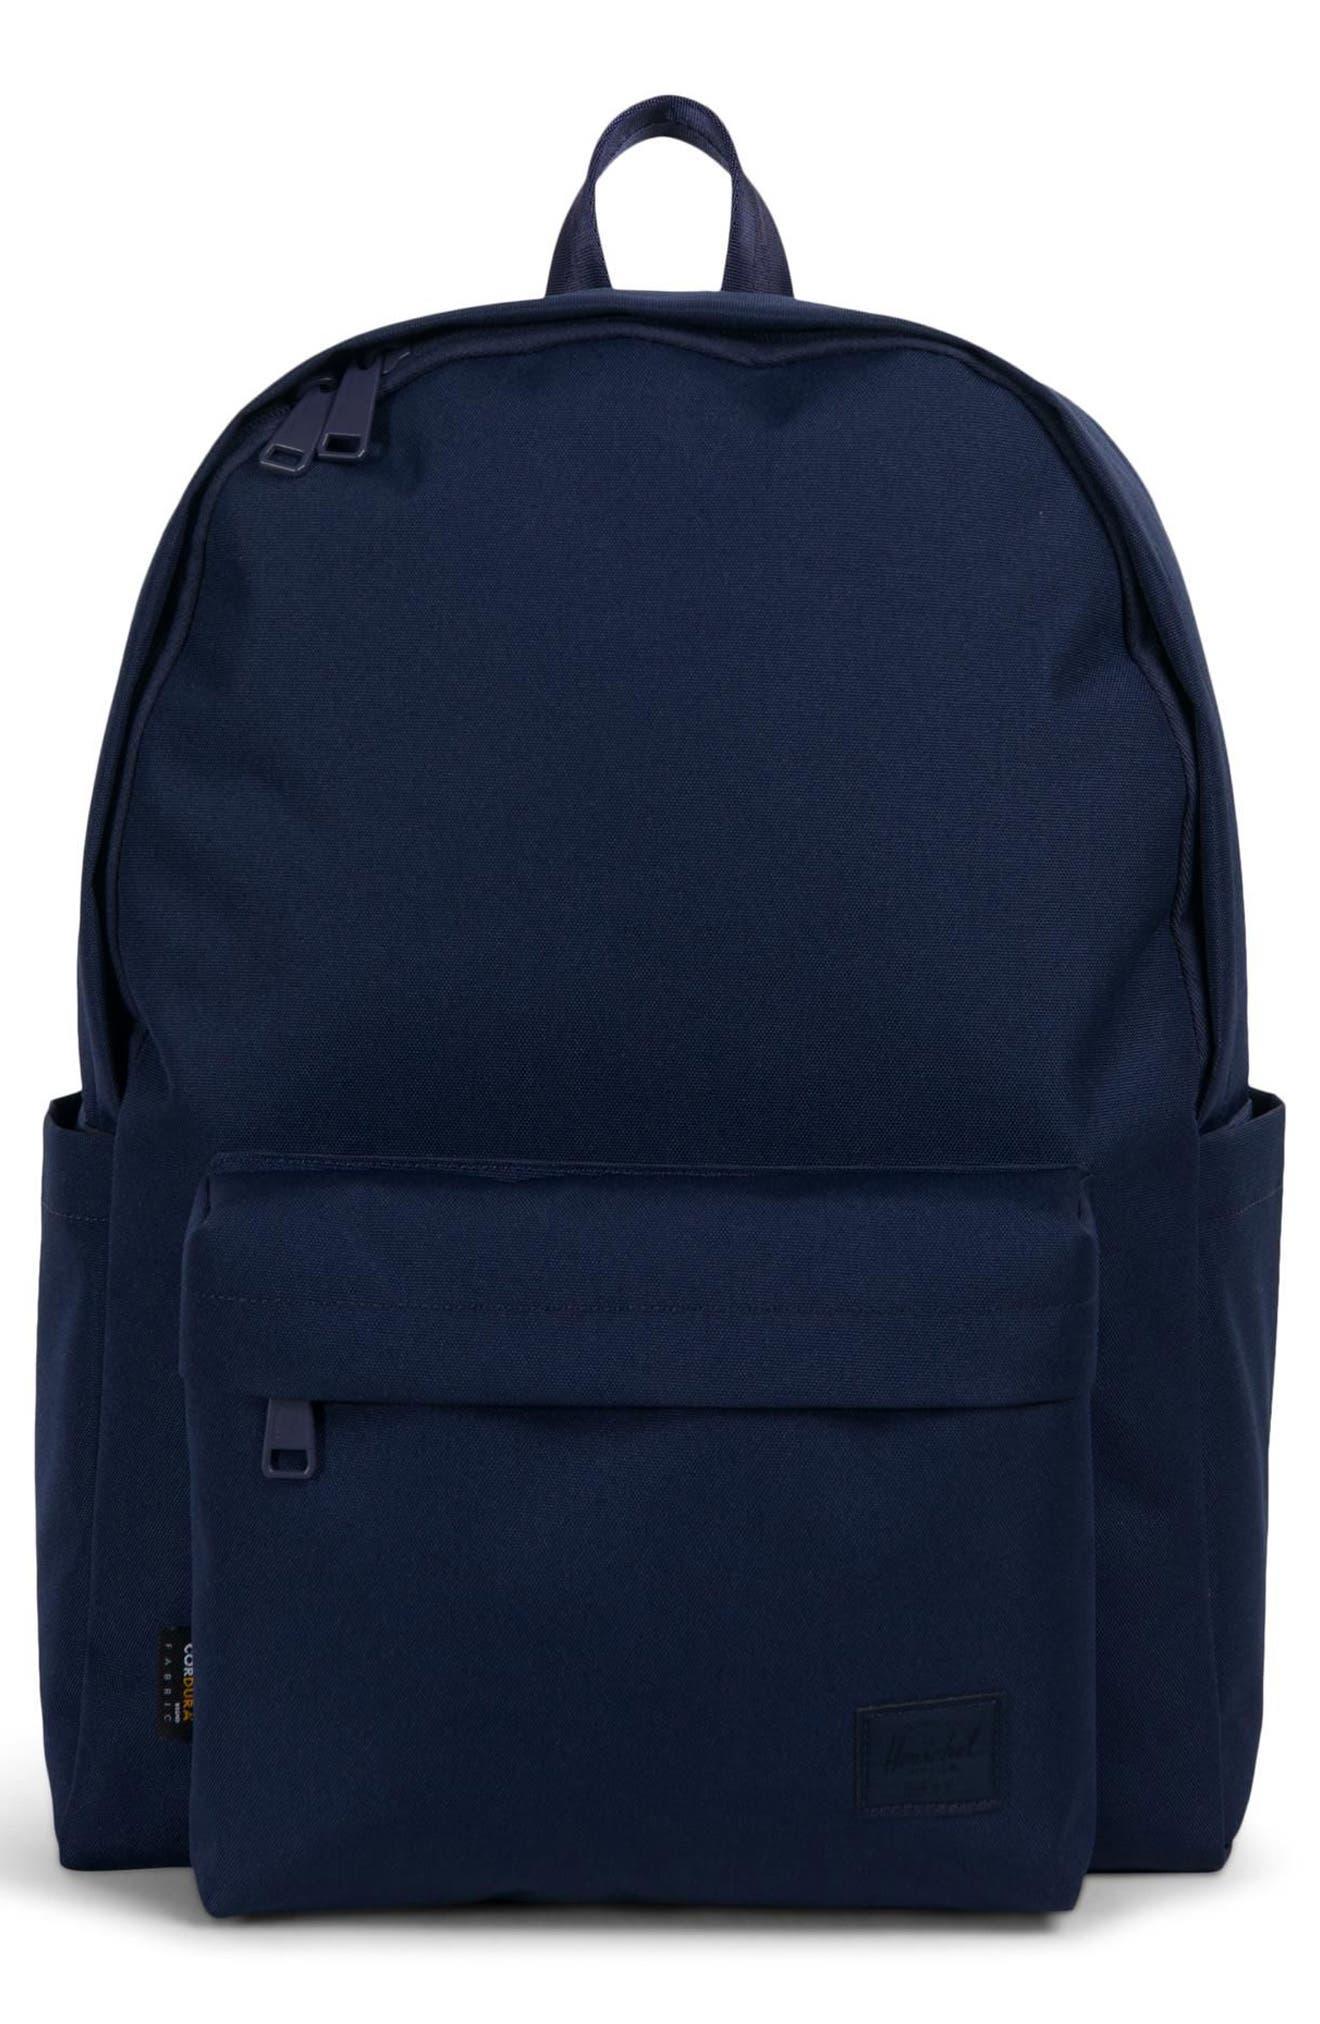 Herschel Supply Co. Berg Backpack - Blue